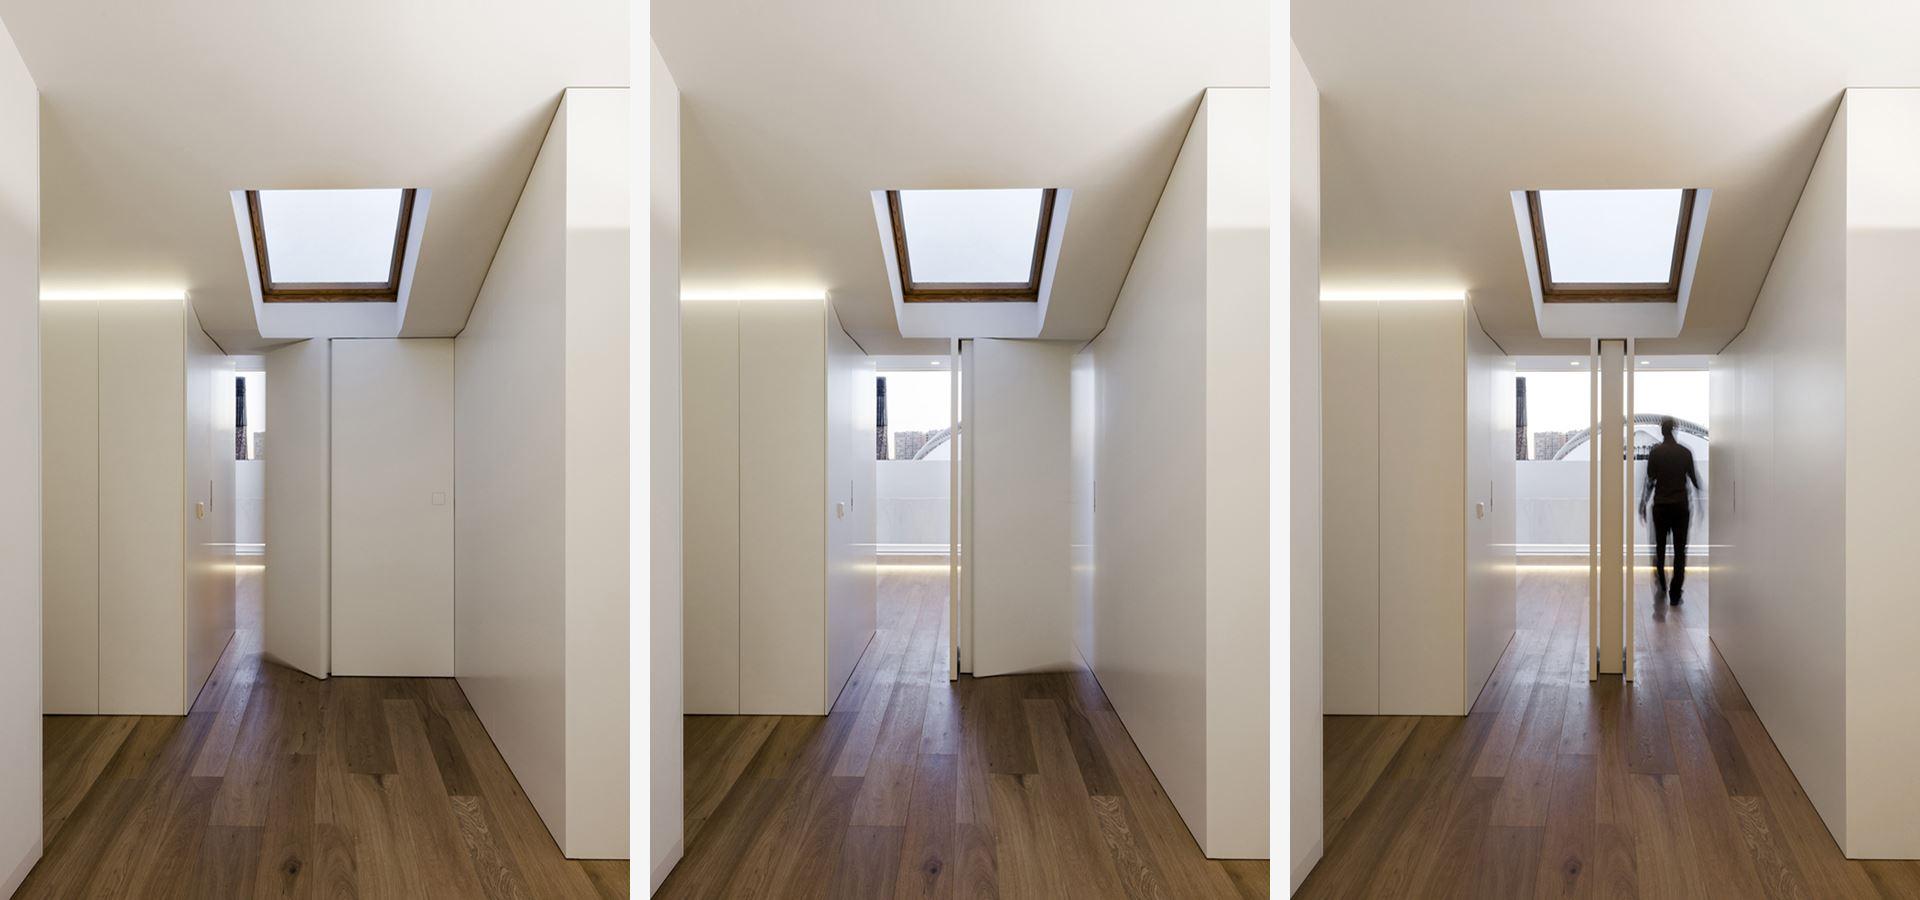 Carpentry Detail - Gallardo Llopis Architects